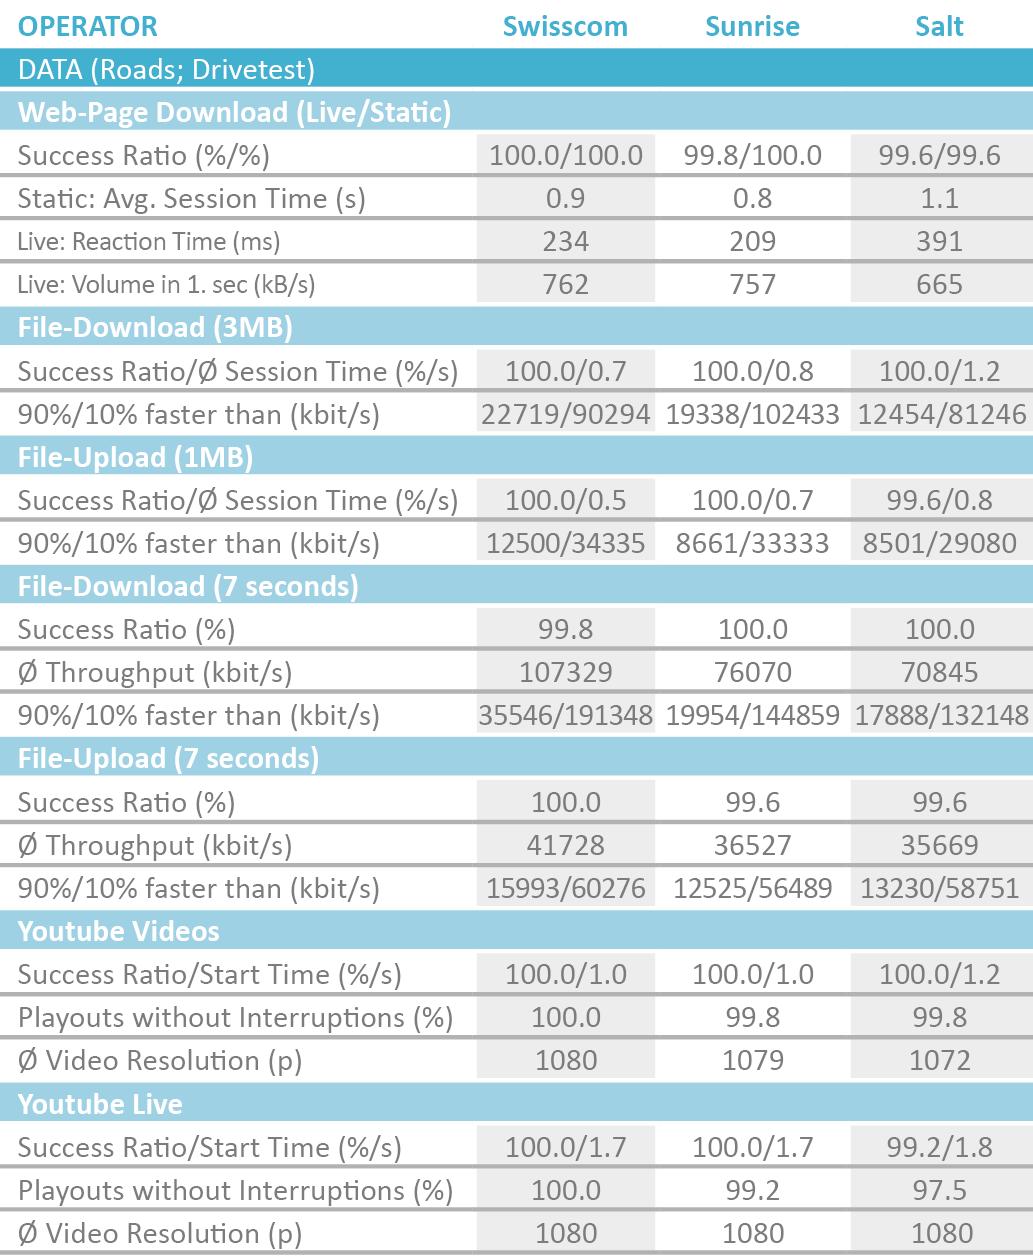 CH_Tabelle_DatenRoadsDrive2019_englisch.png